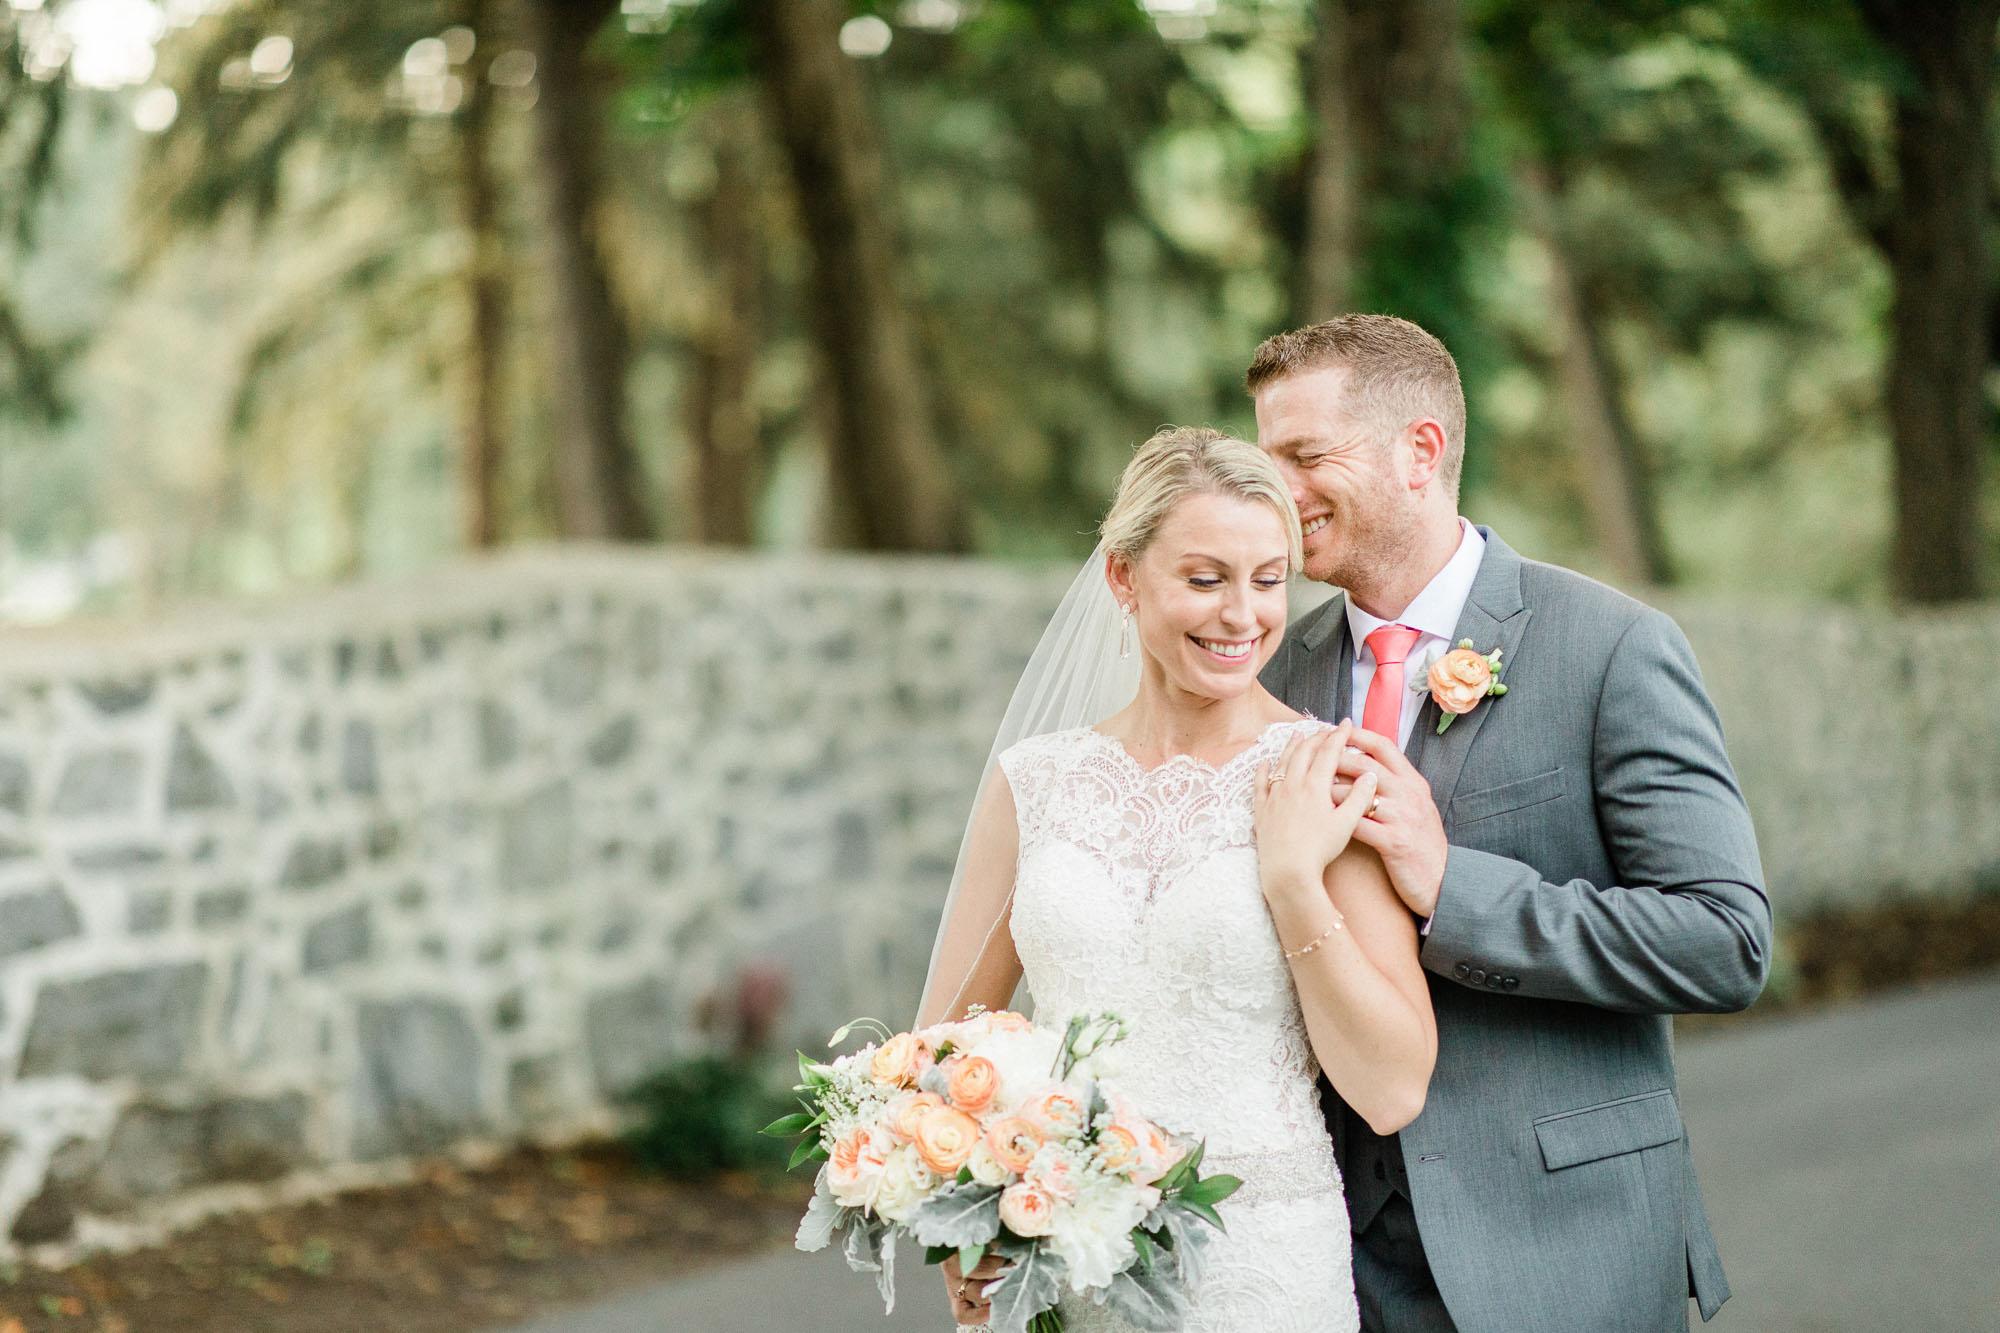 Allenberry-resort-historic-pennsylvania-wedding-22283.jpg